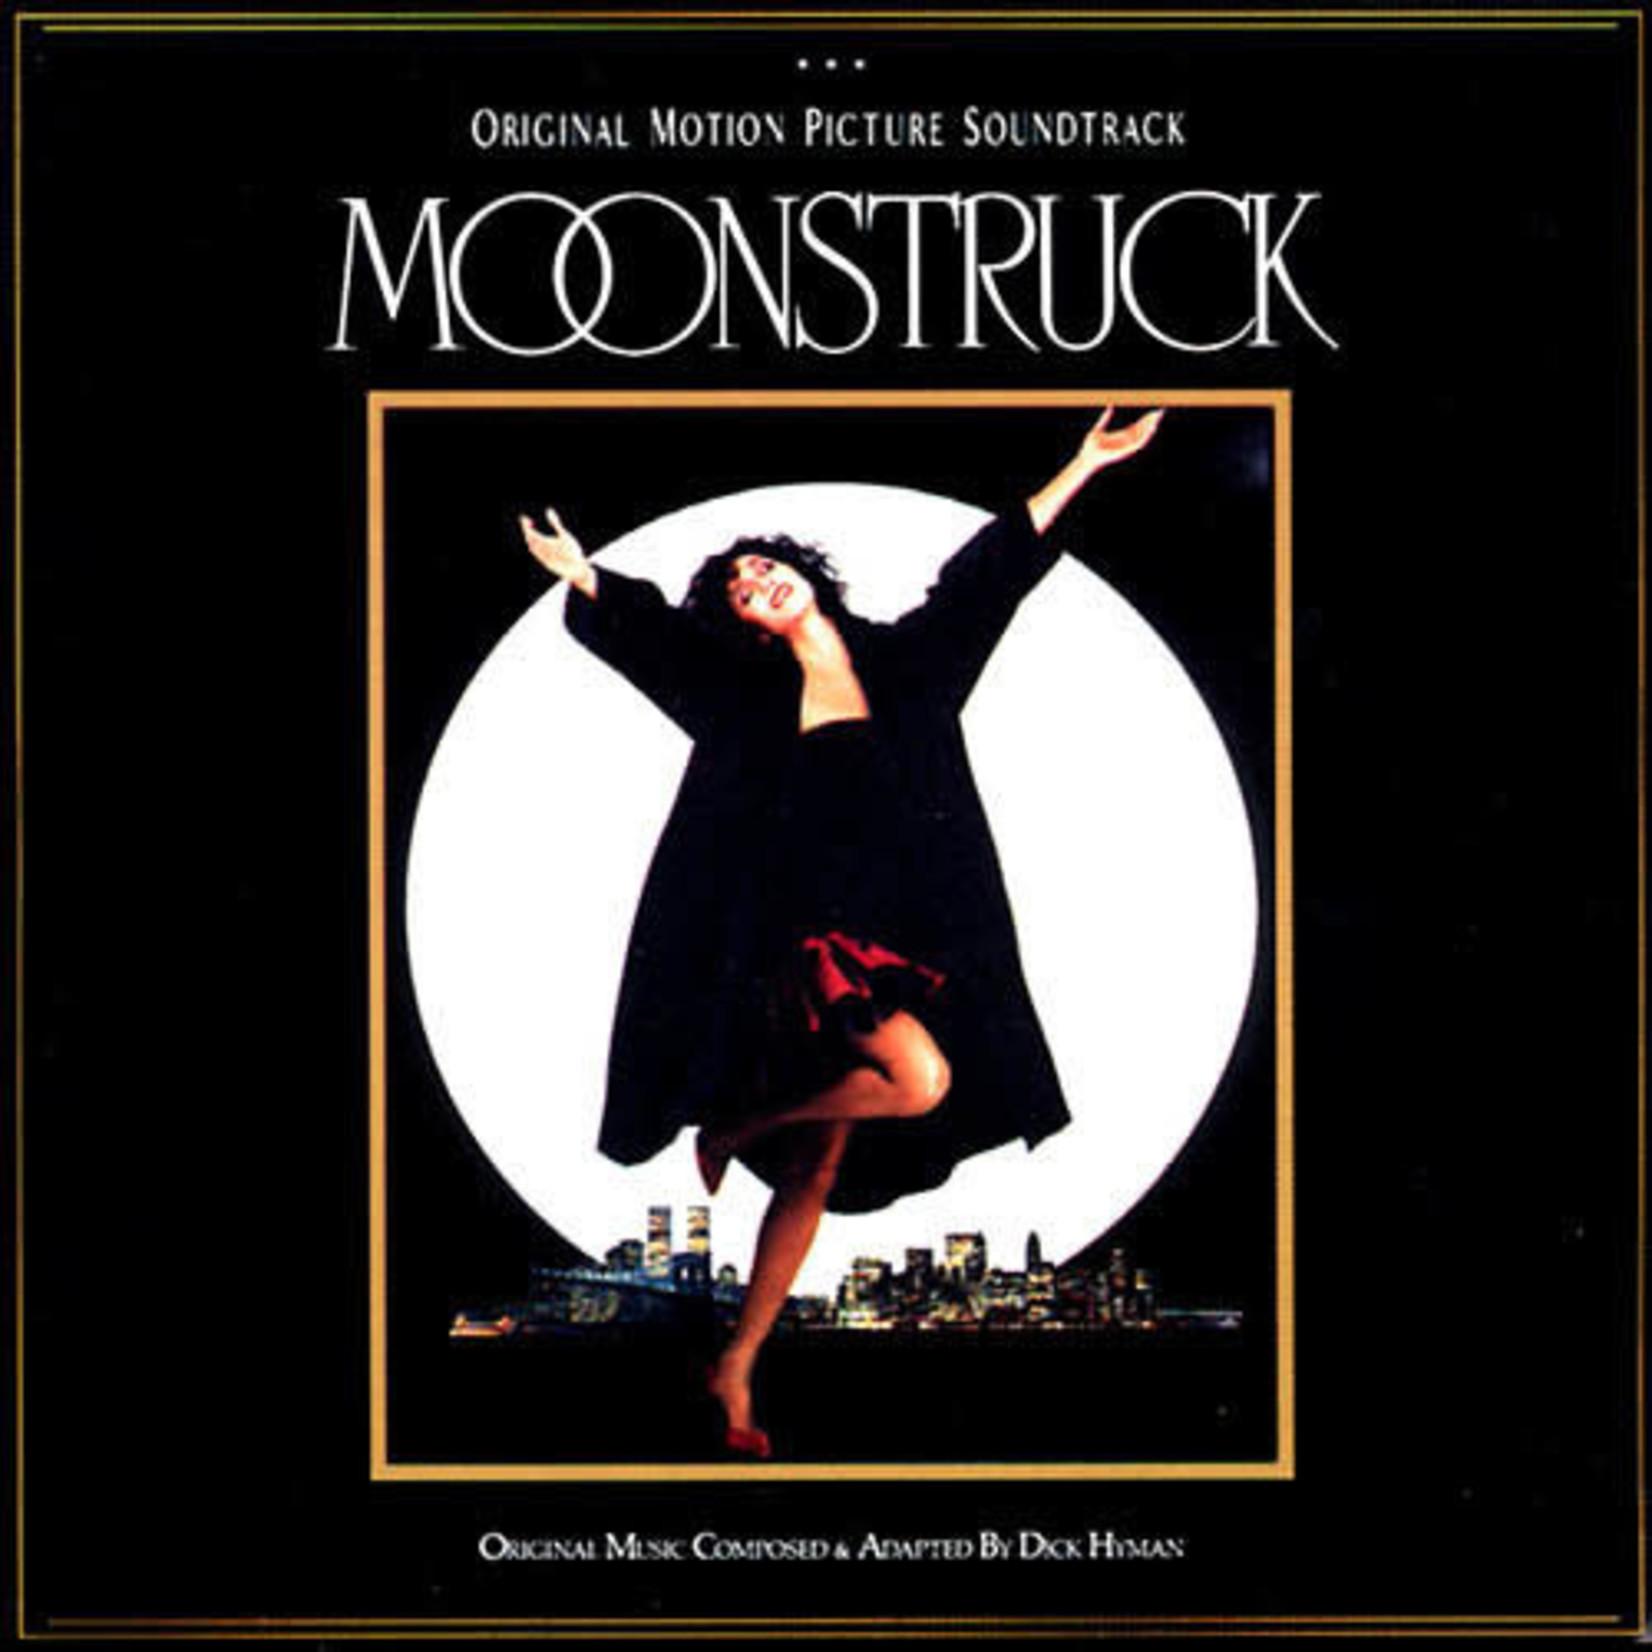 [Vintage] Hyman, Dick: Moonstruck (Soundtrack)